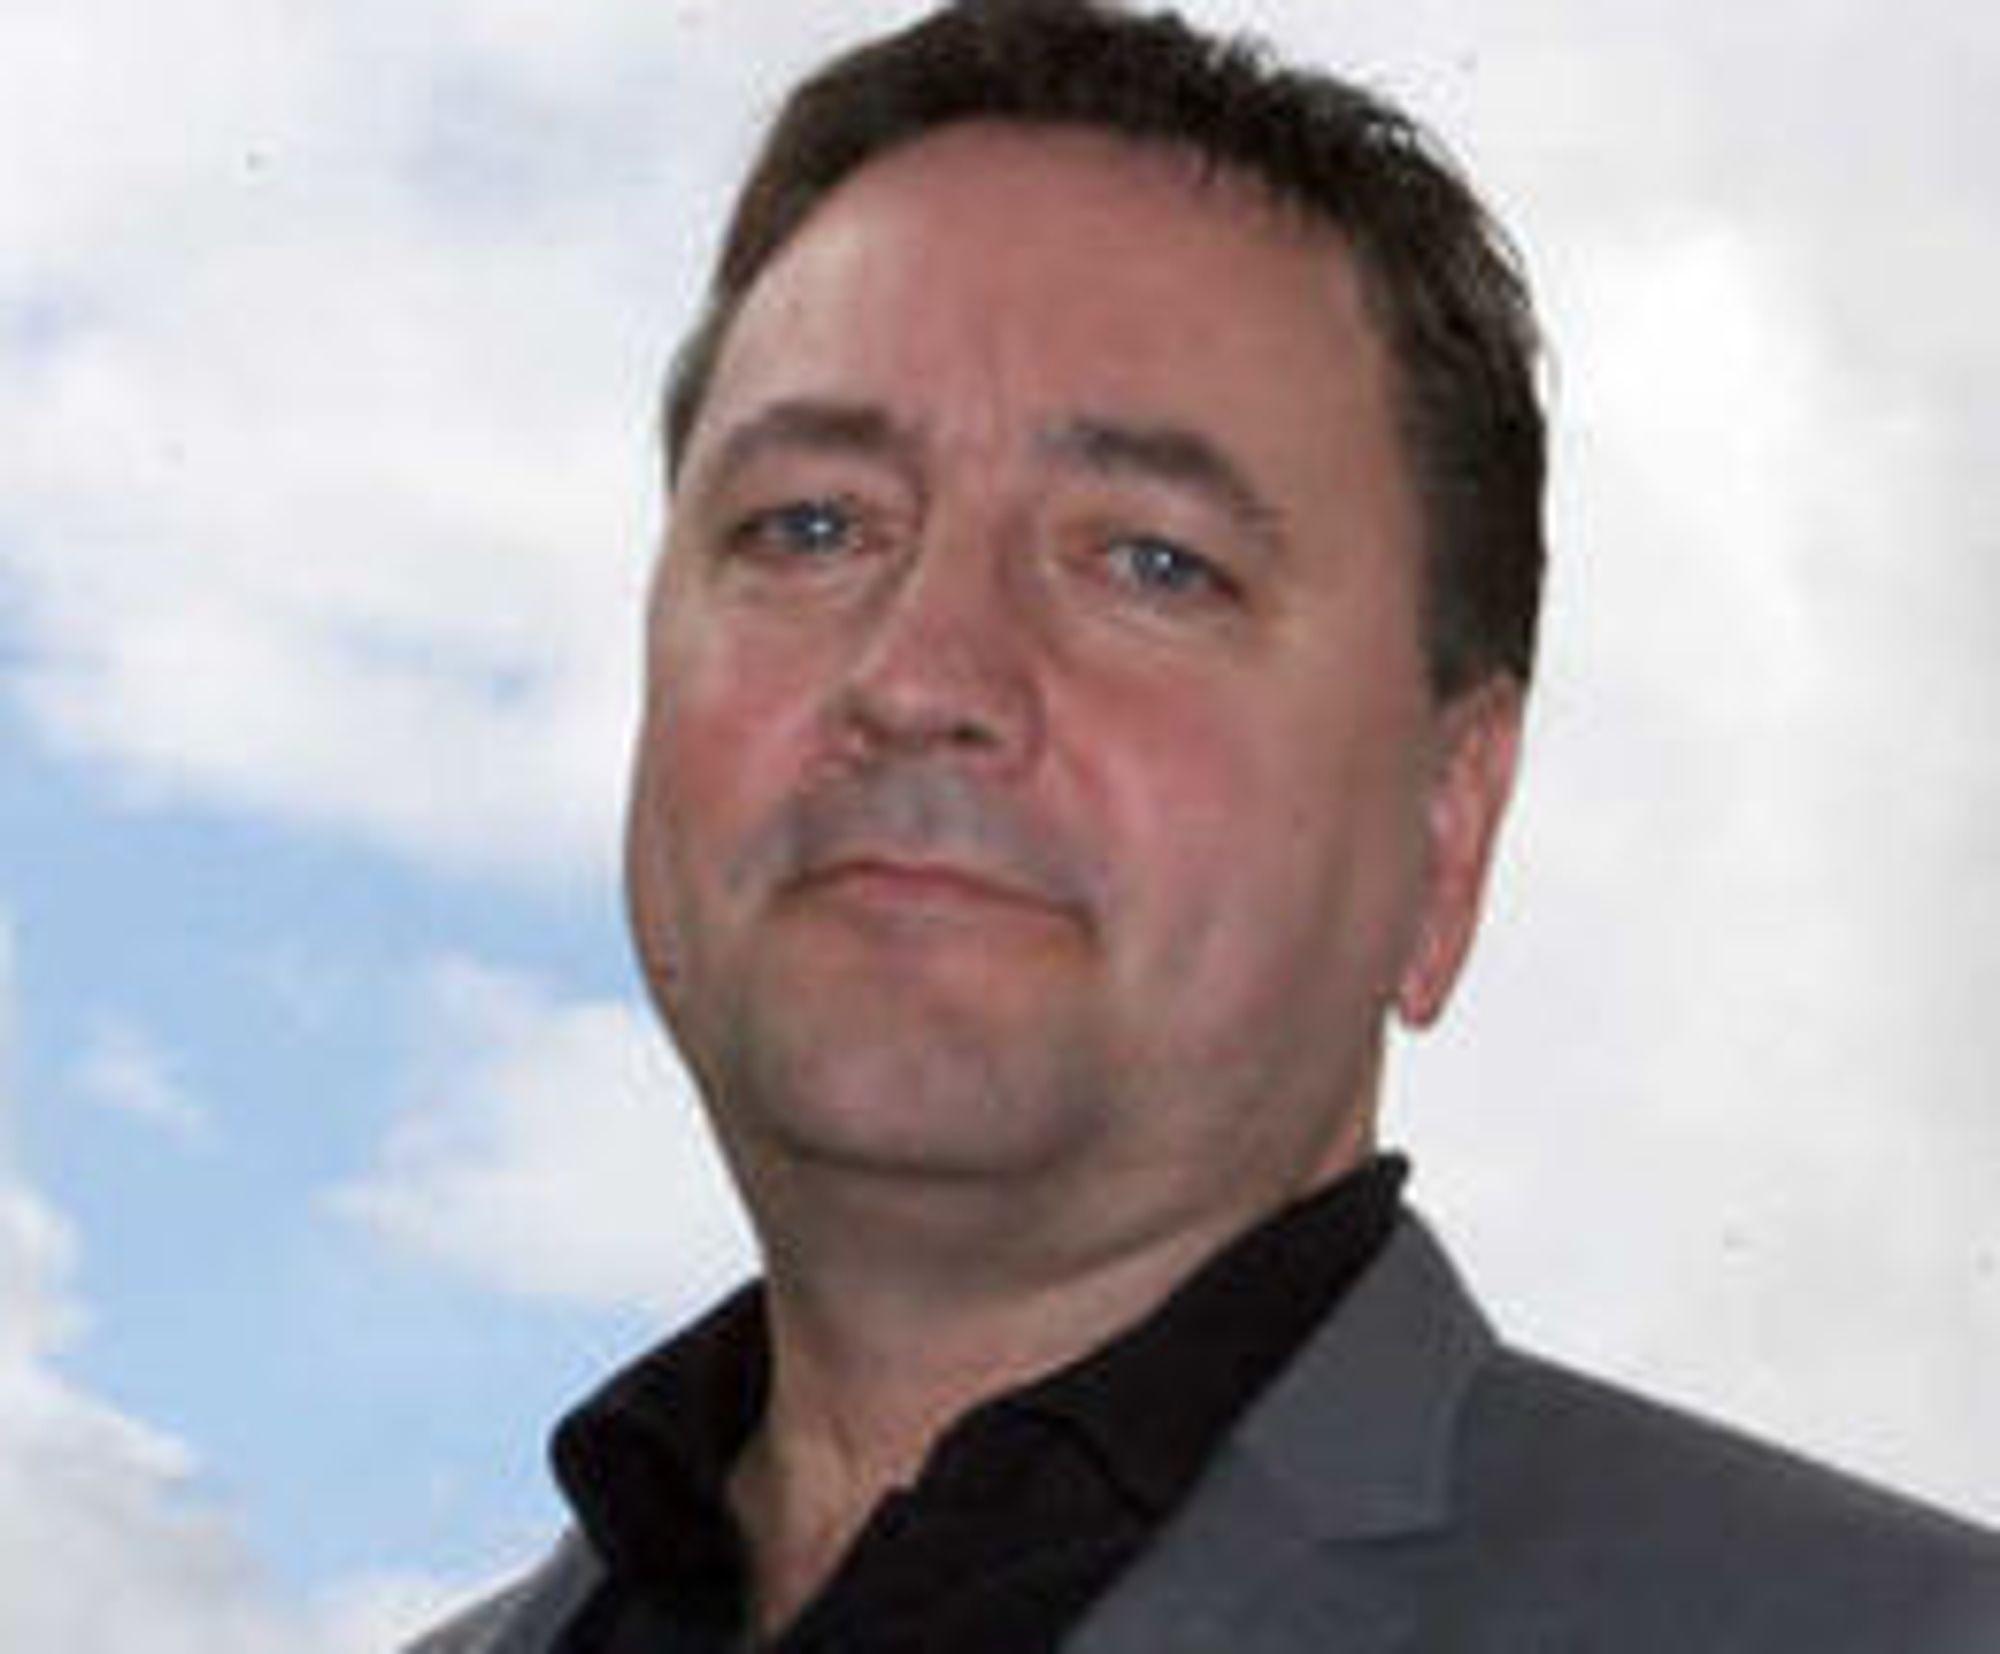 Narvik kommunes IT-sjef Per Jakobsen.